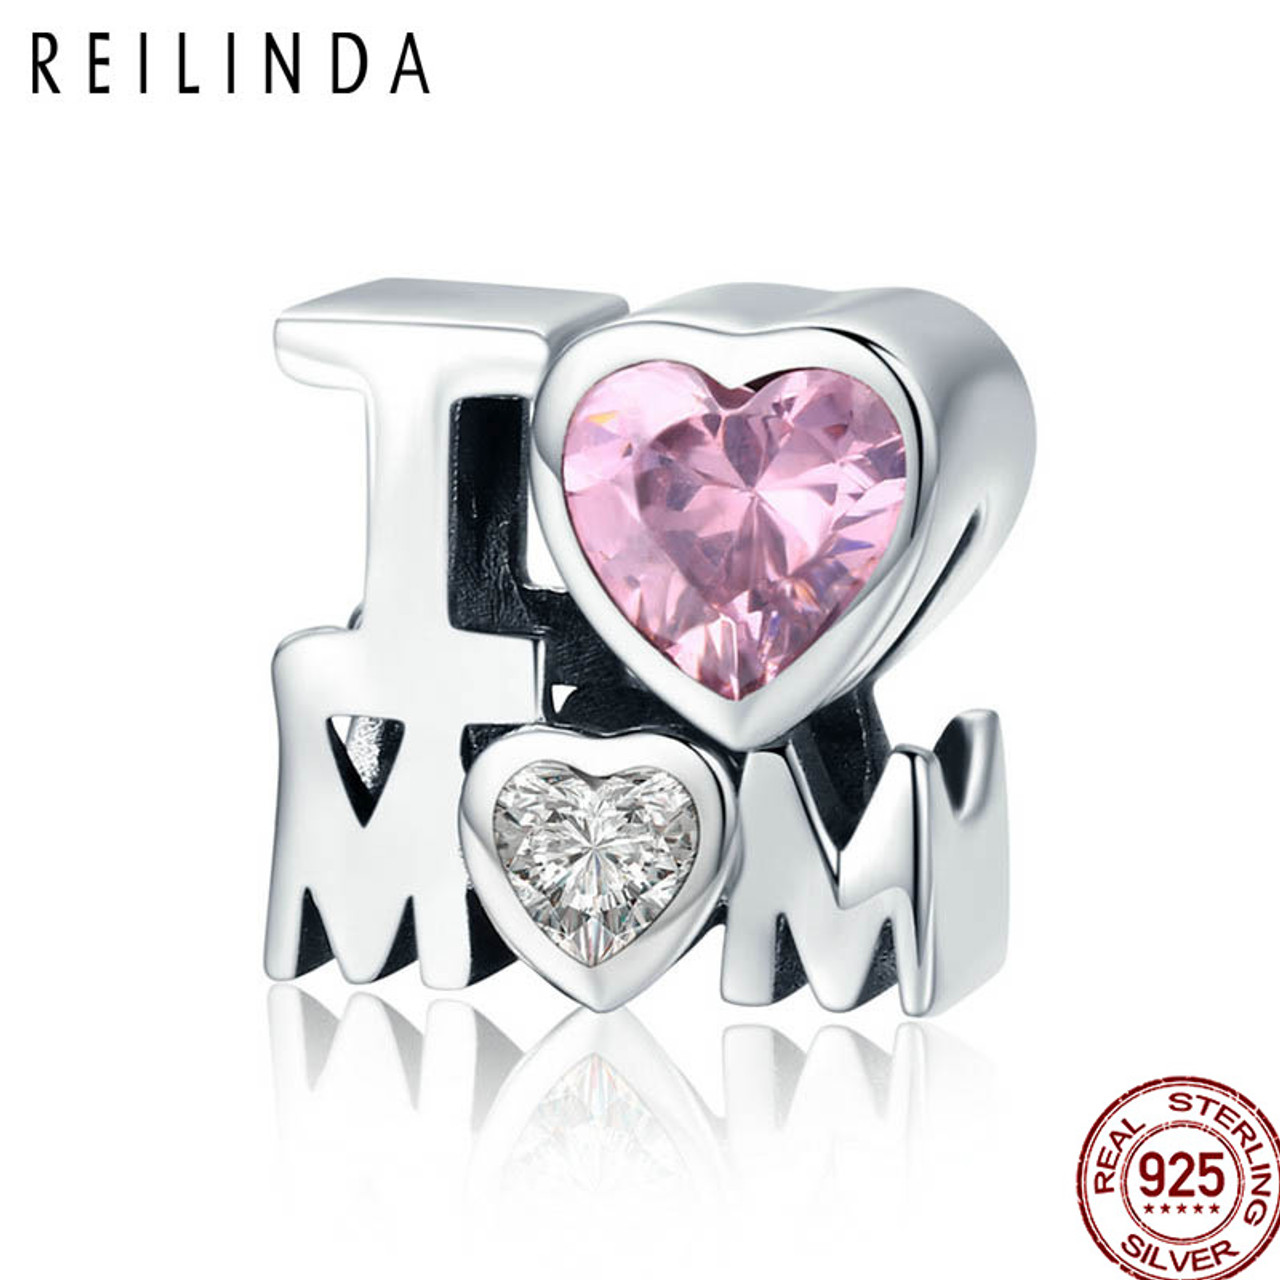 100/% Genuine 925 Sterling Silver Mom in Heart Pendant Charm fit Women Bracelets DIY Jewelry Making Mother Gift